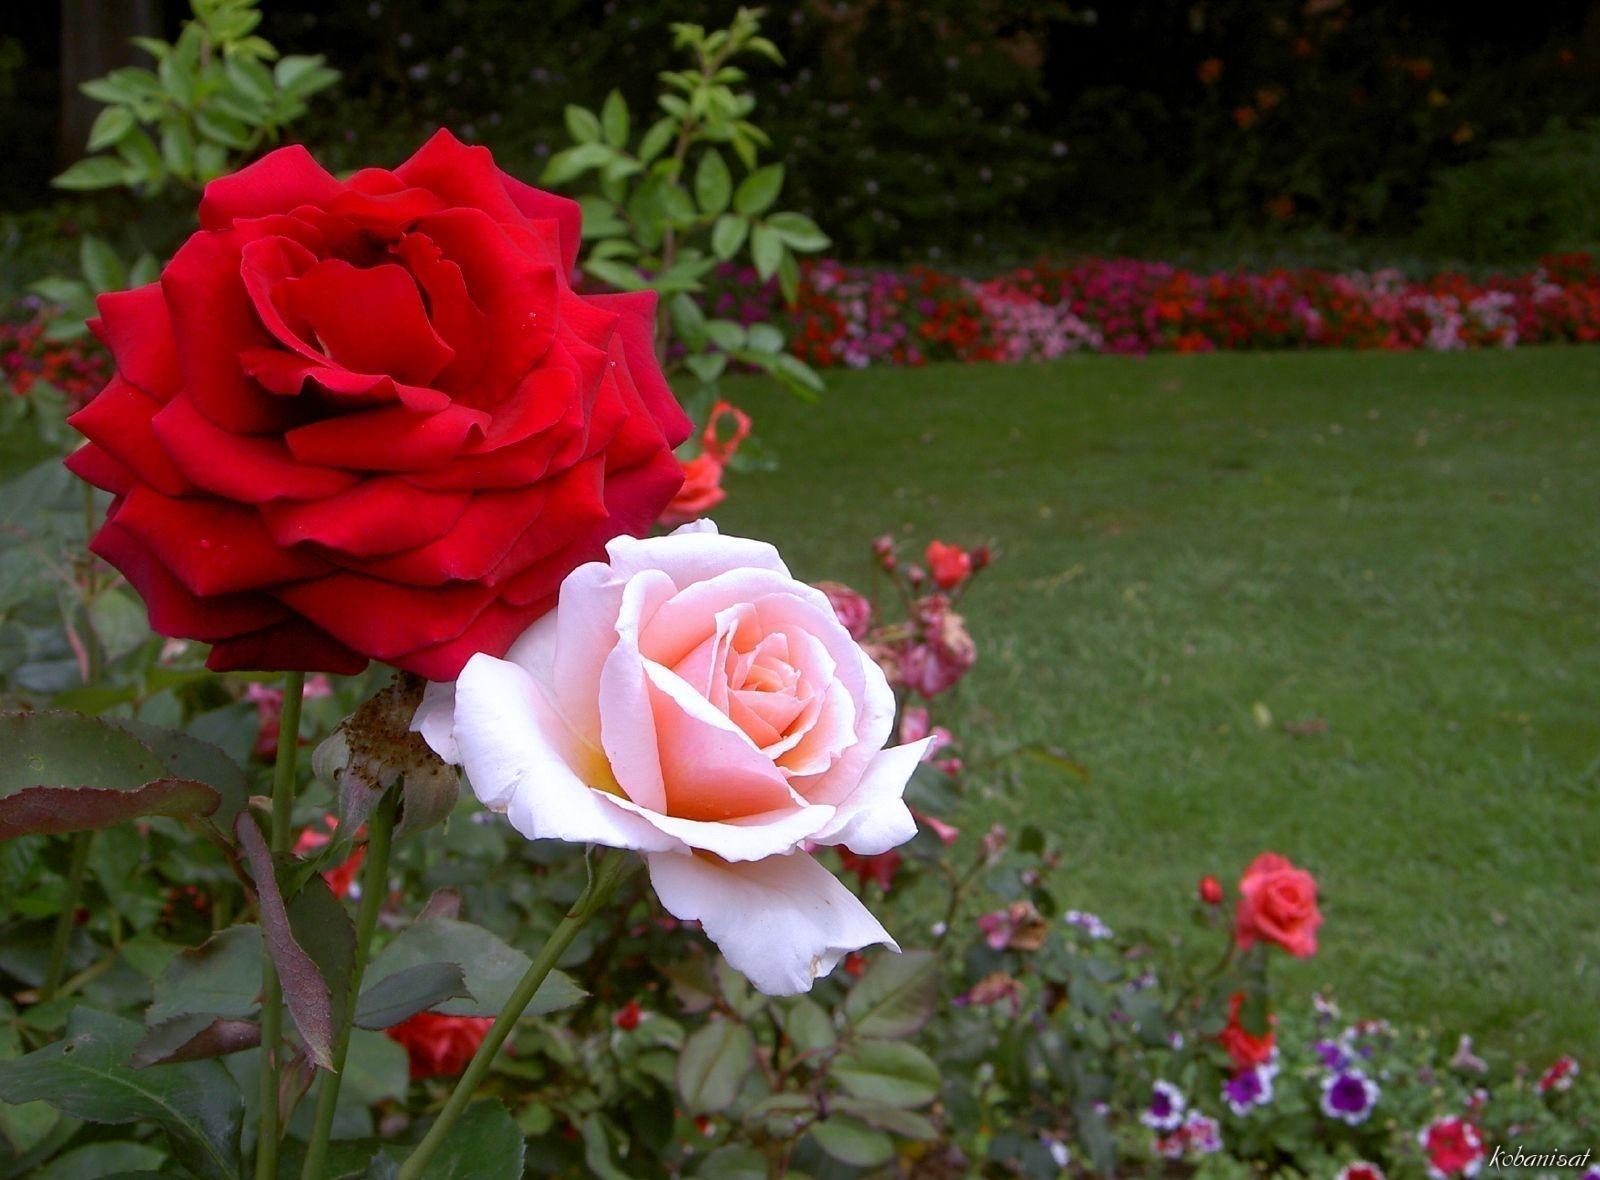 صور صور اجمل ورد , الورد وما يقوله فى صوره